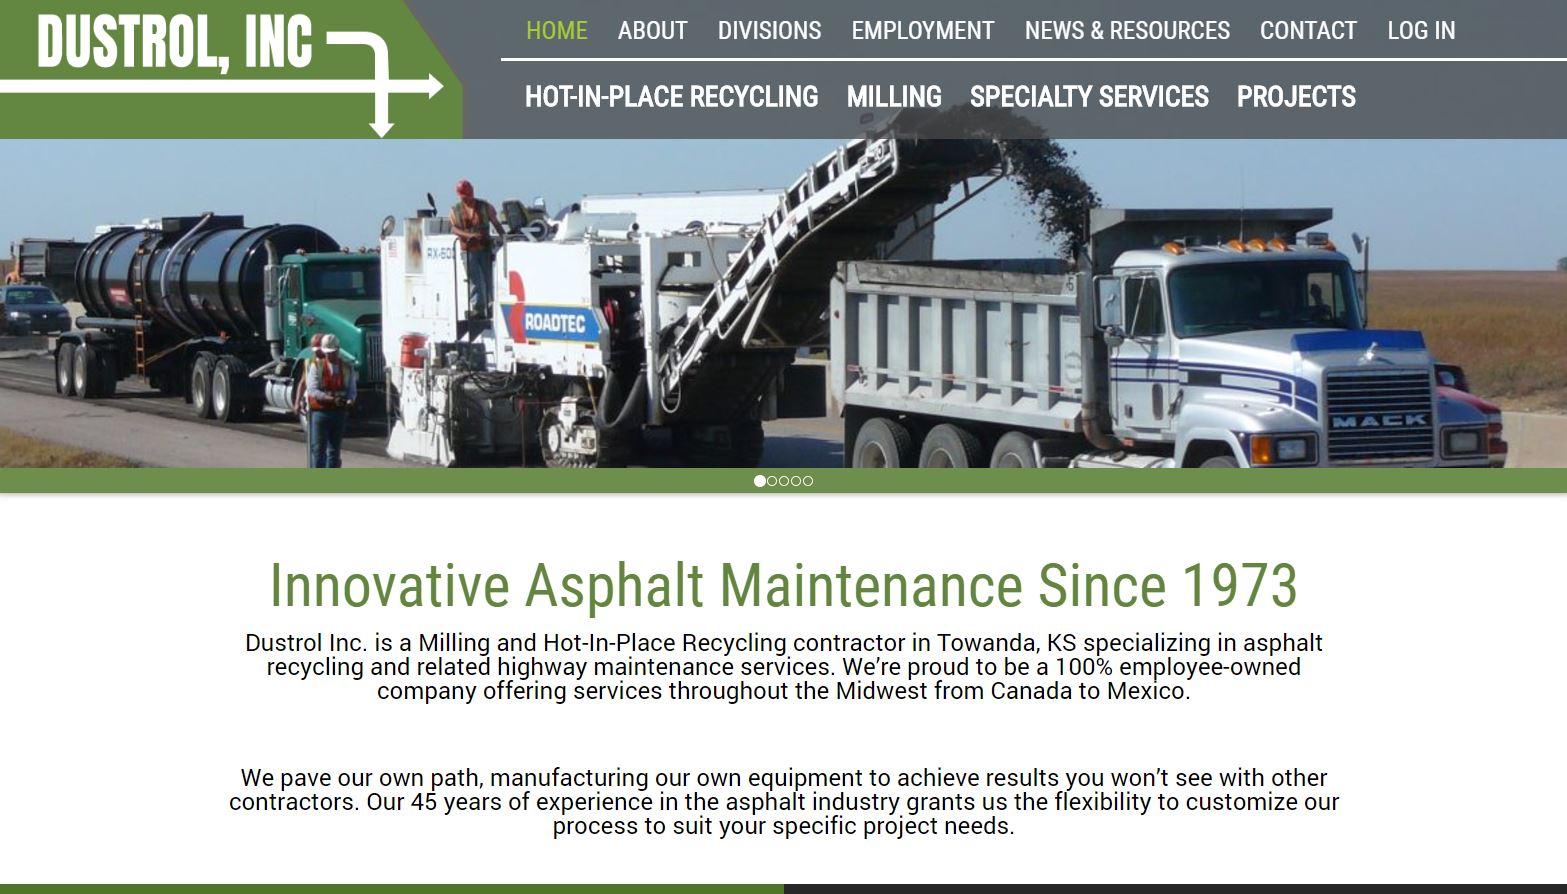 Dustrol, Inc's. New Website